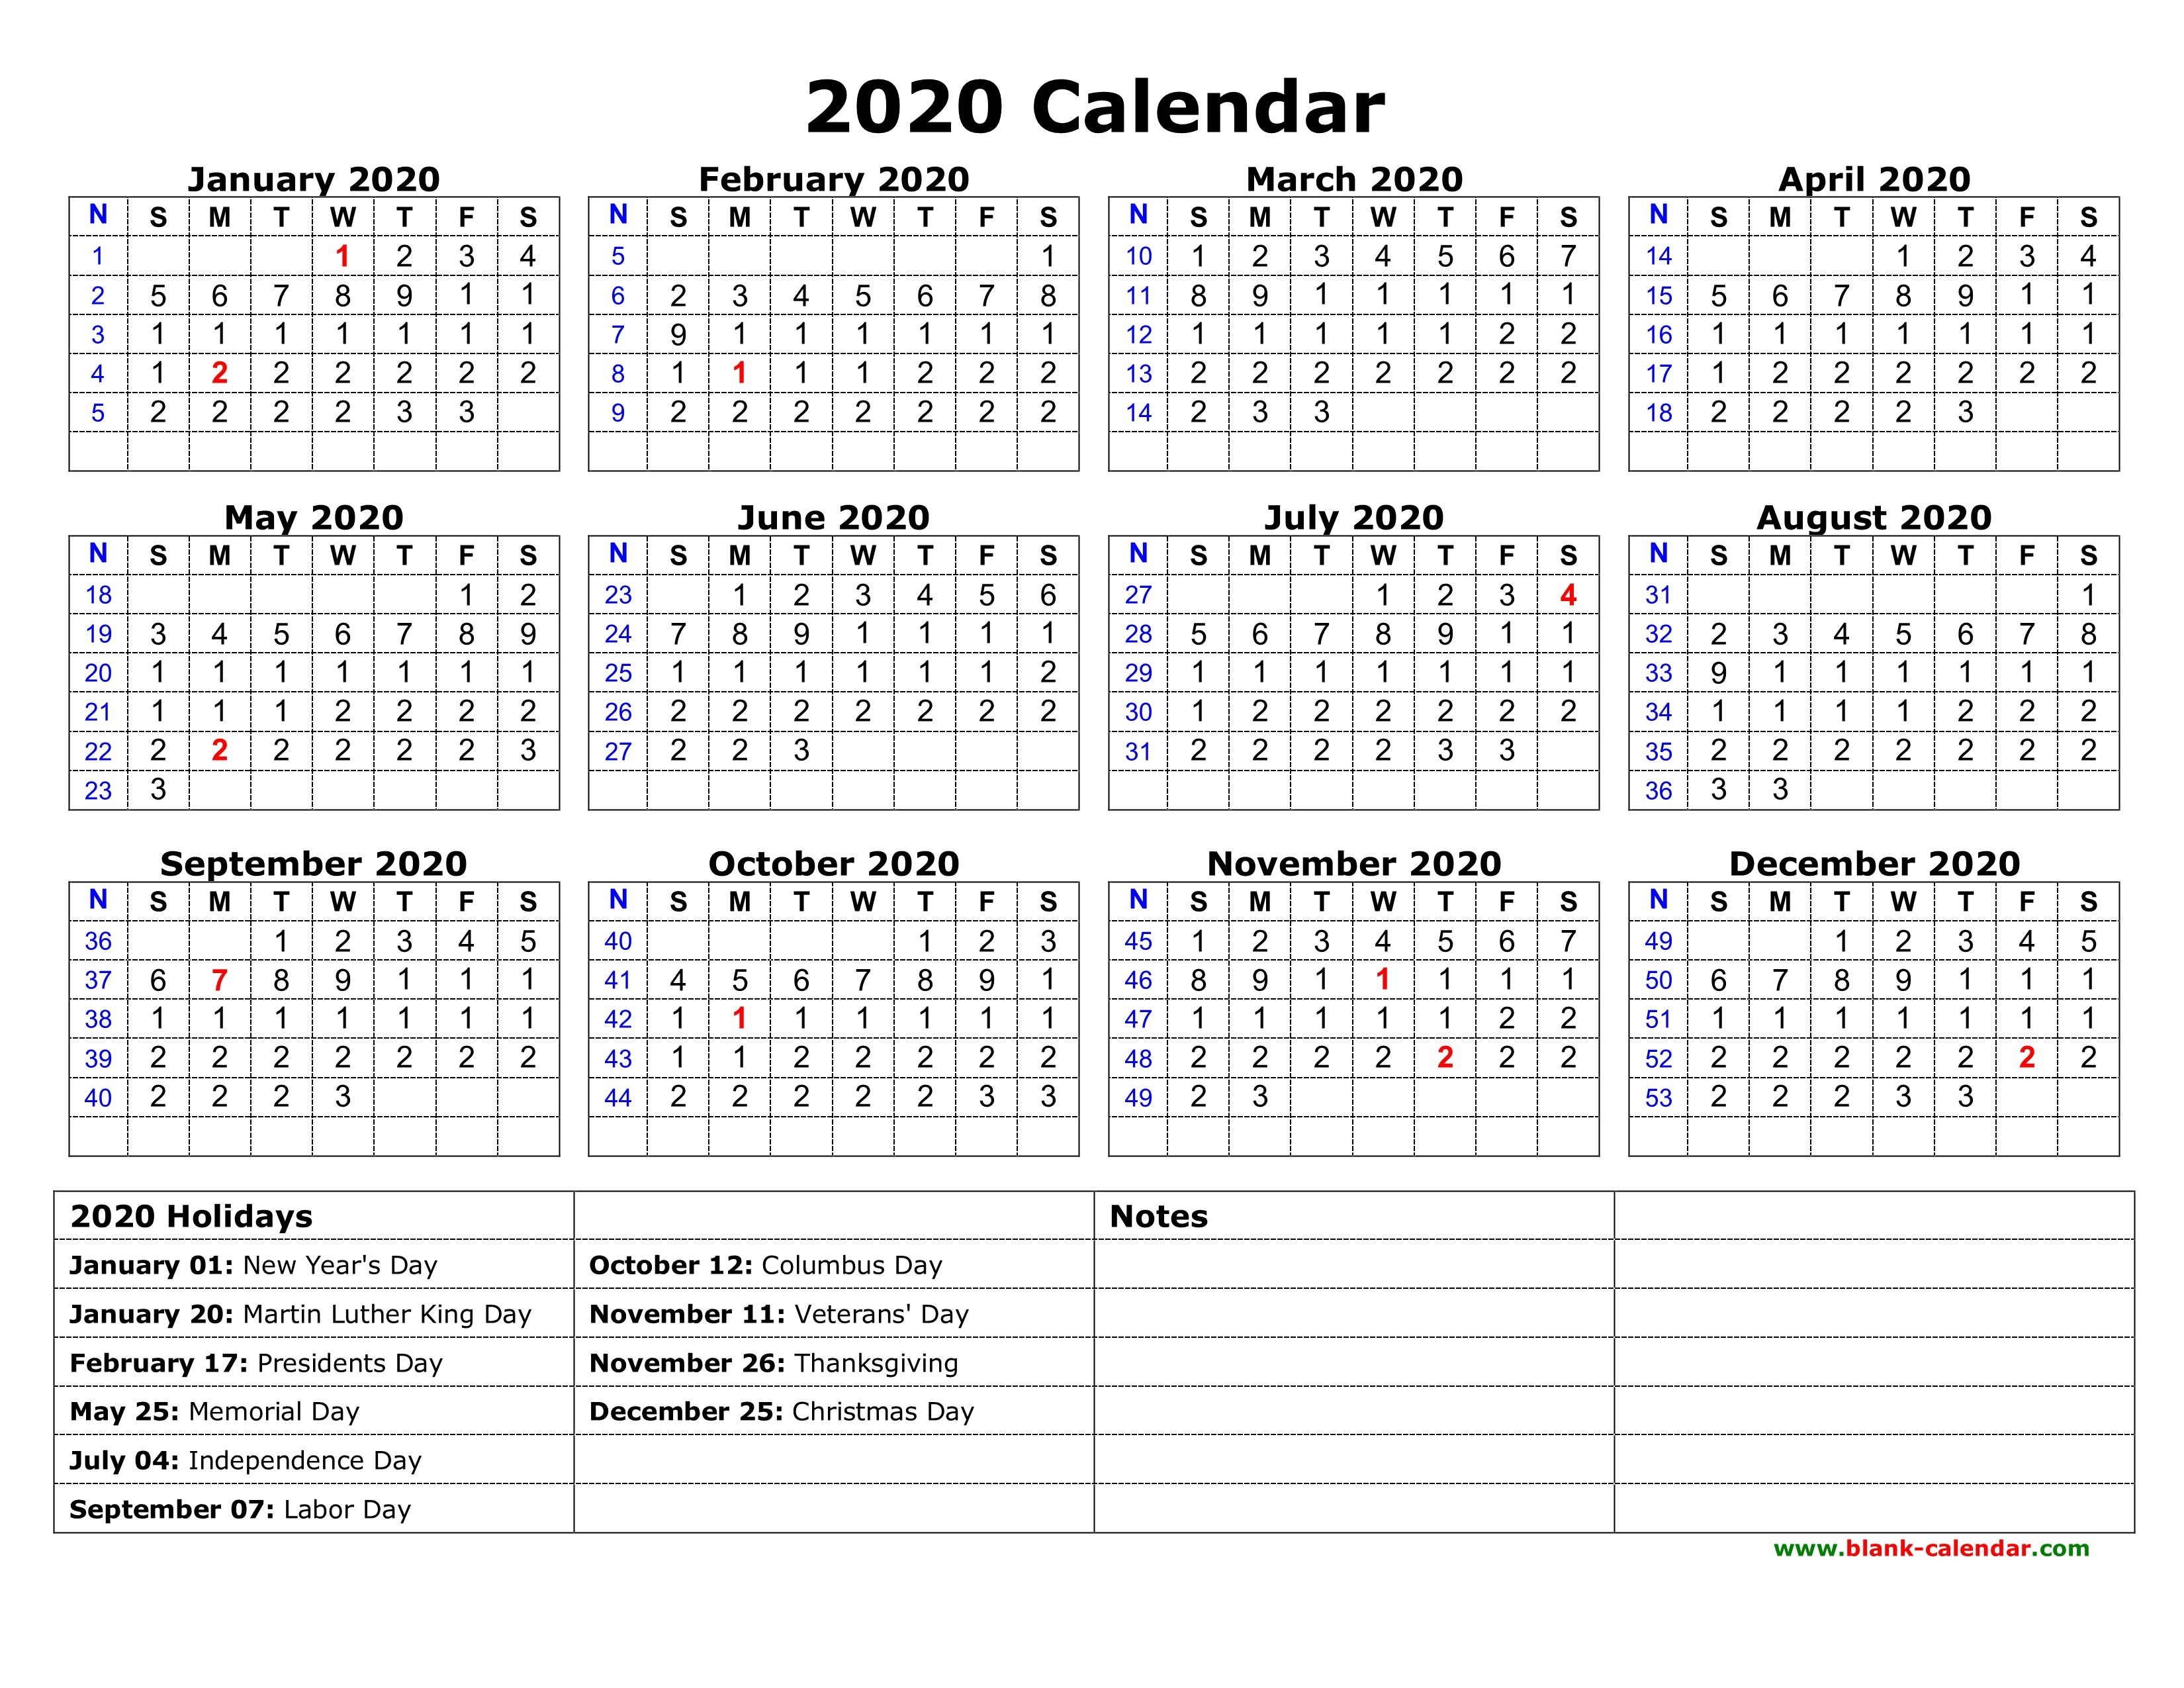 Weekly Calendar 2020 Printable Free Download Printable Calendar 2020 with Us Federal